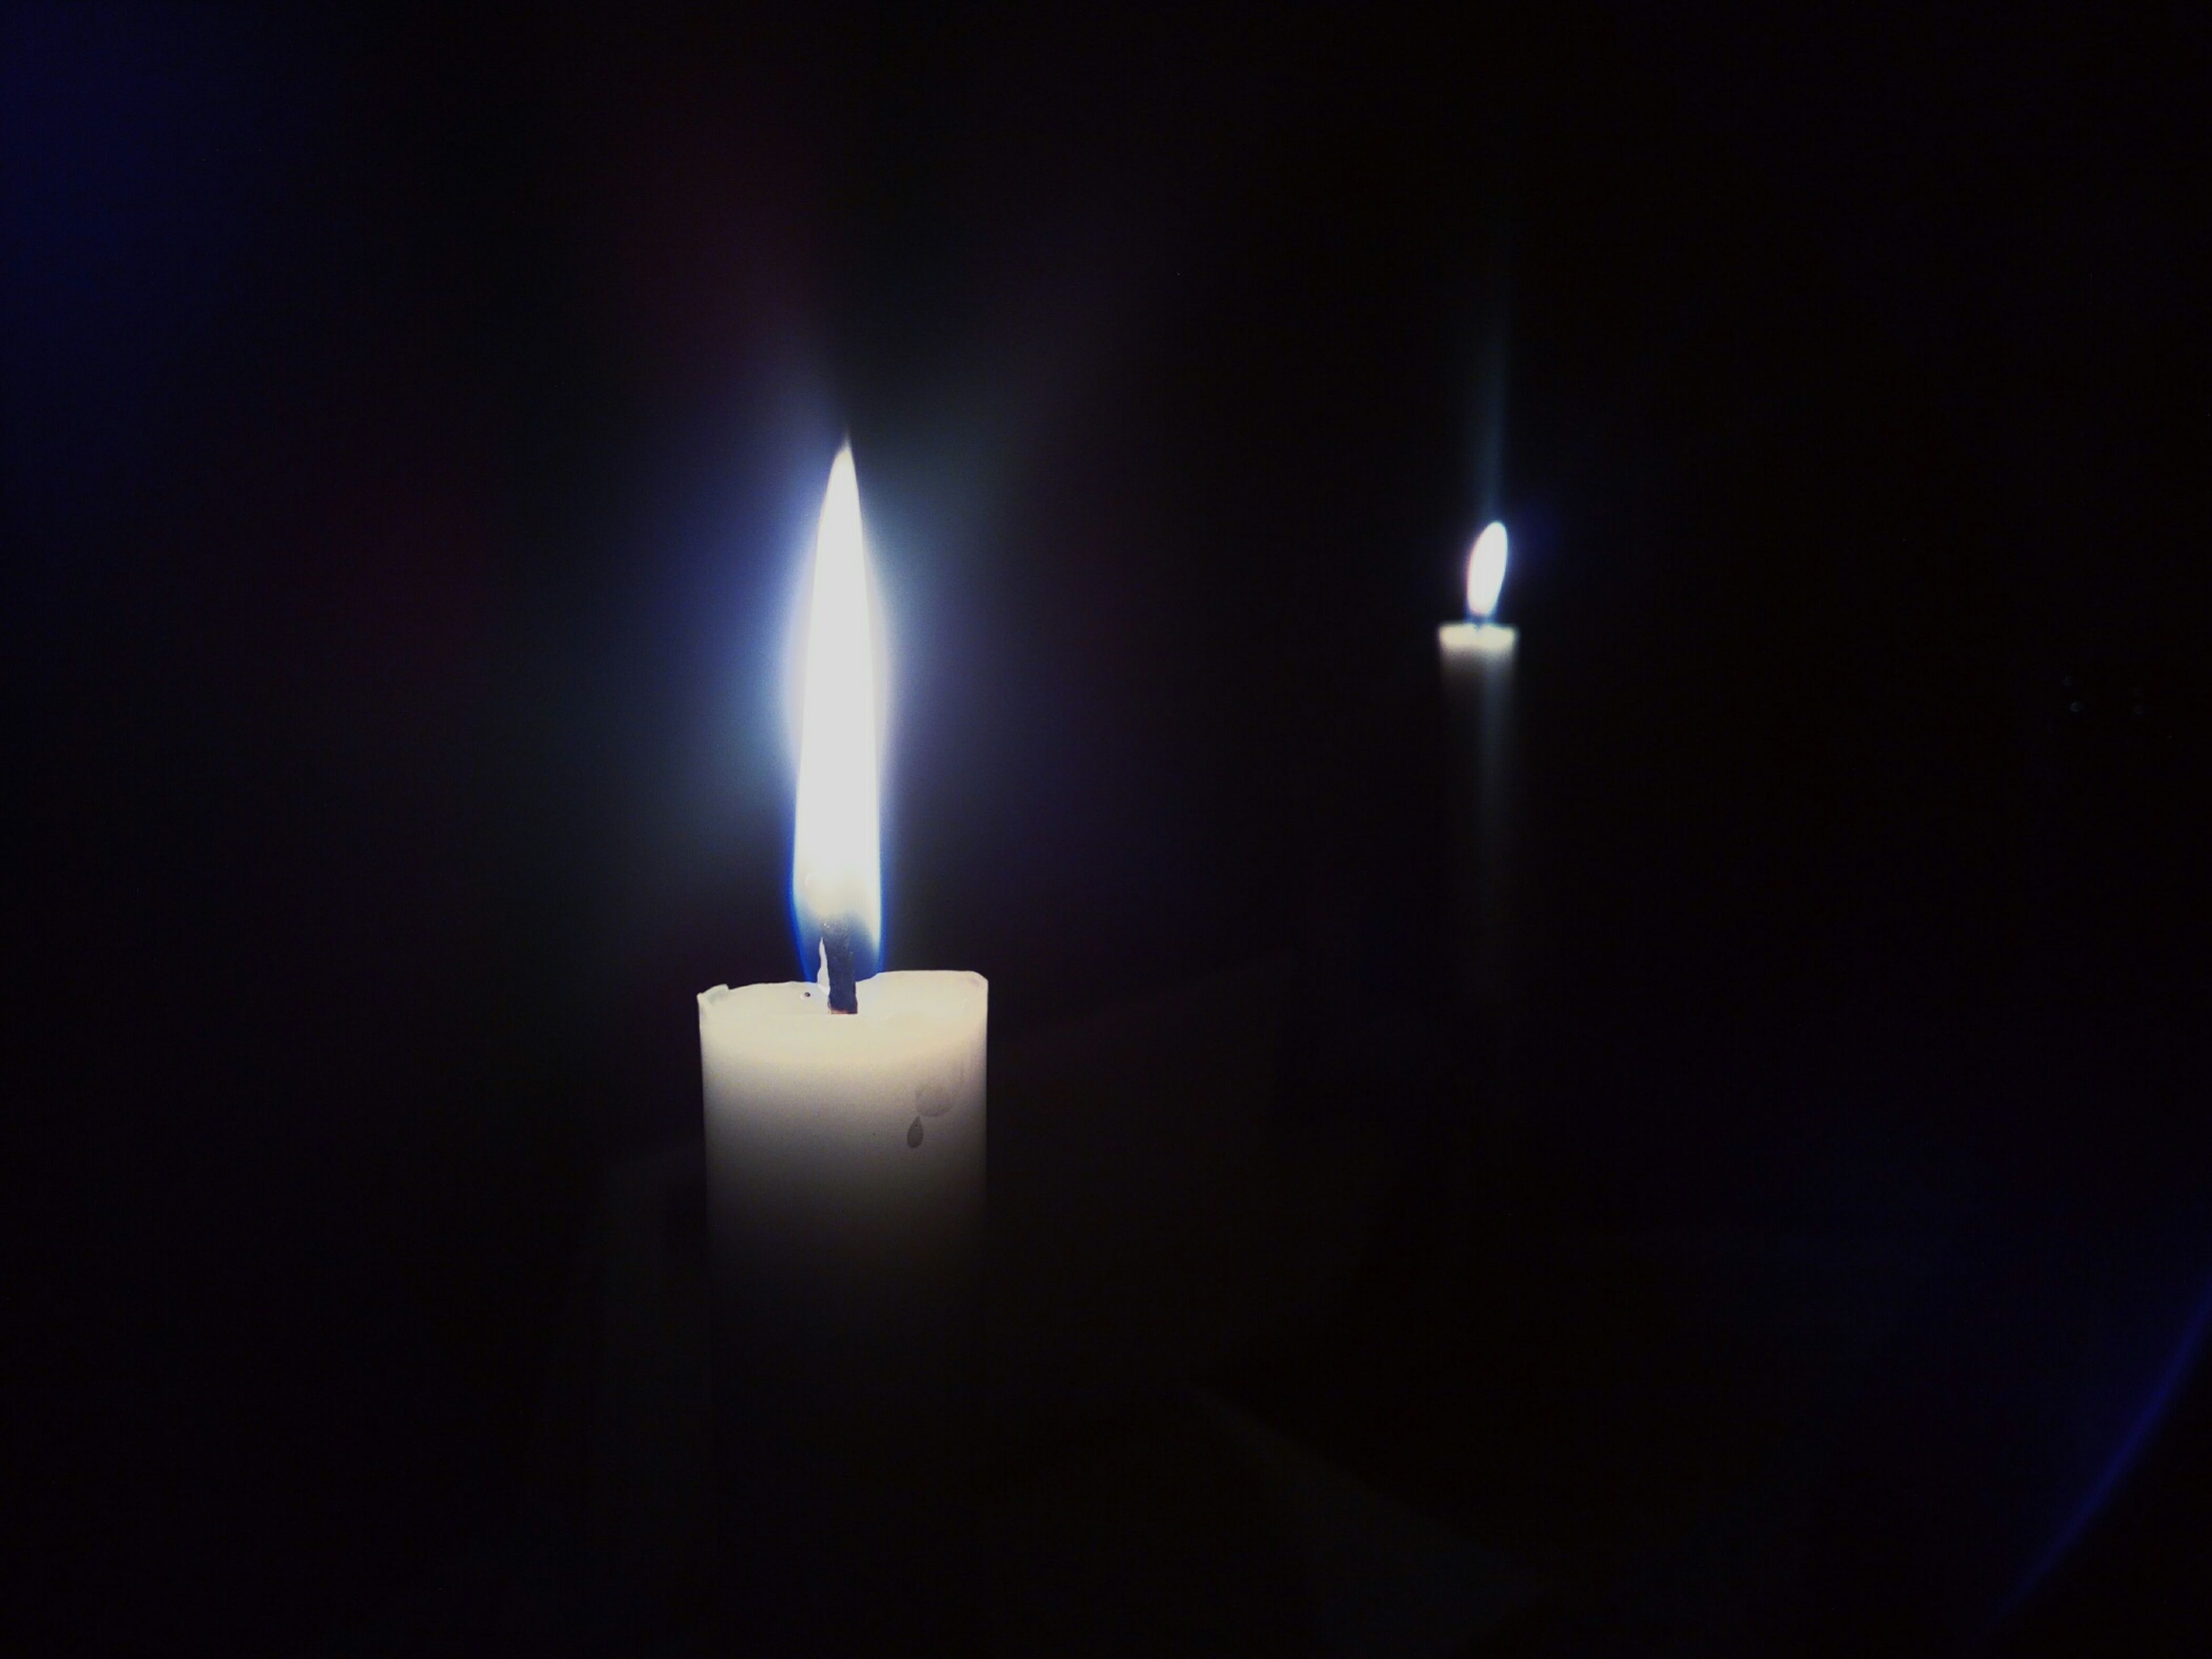 illuminated, glowing, burning, indoors, flame, candle, lit, lighting equipment, darkroom, night, dark, heat - temperature, light - natural phenomenon, fire - natural phenomenon, candlelight, electricity, black background, close-up, copy space, studio shot